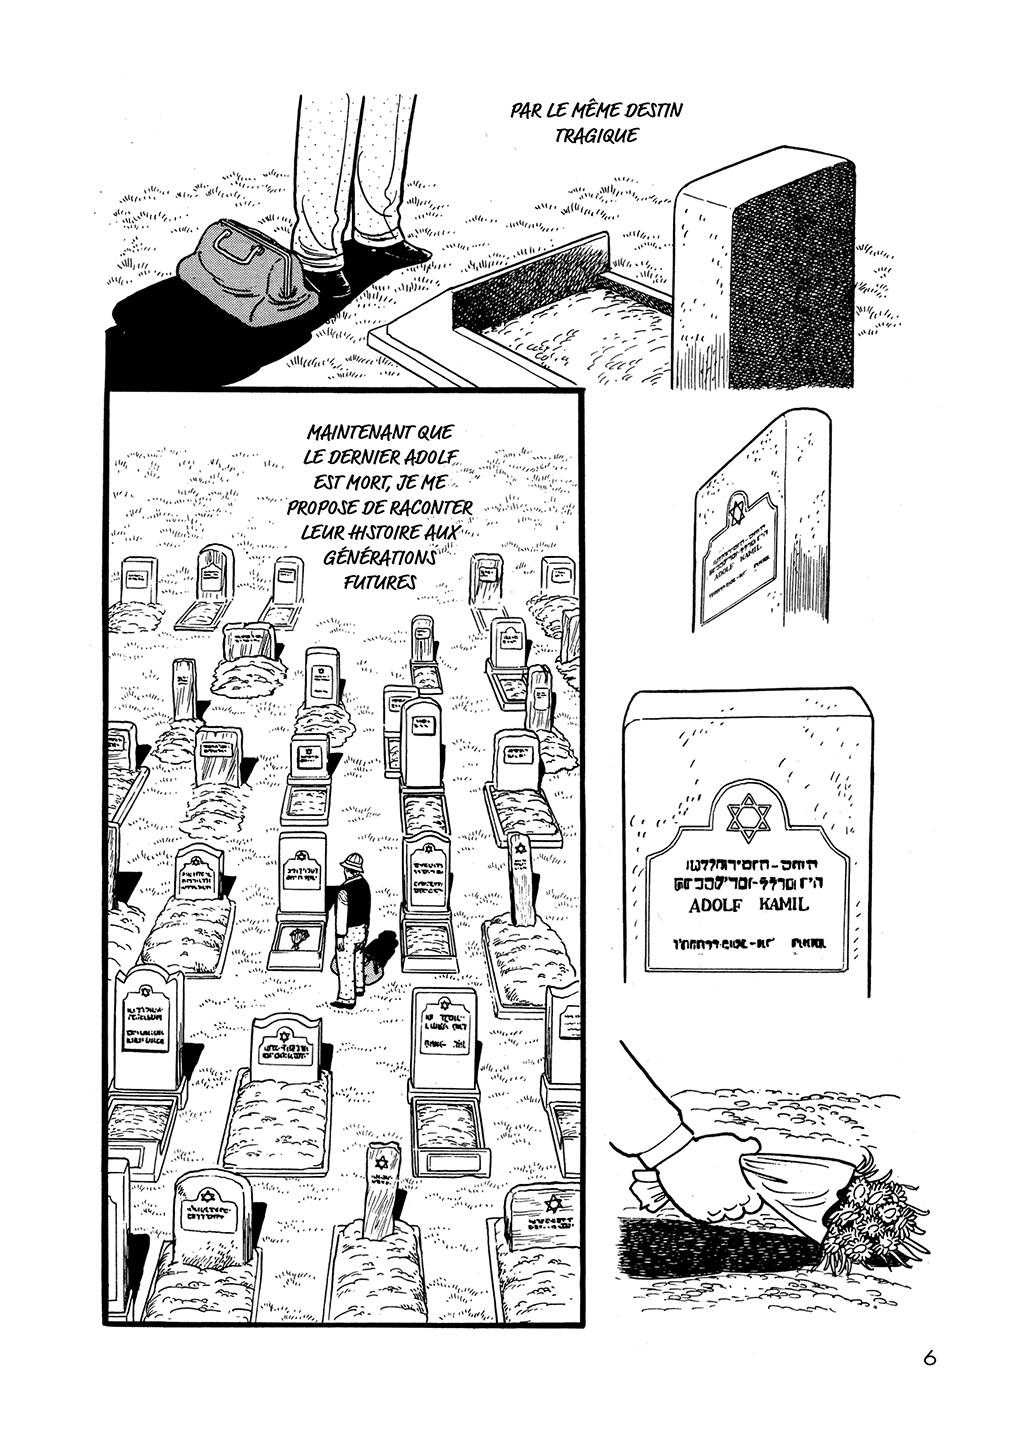 L'Histoire des 3 Adolf – Tome 1 – Osamu Tezuka – © Éditions Delcourt/Tonkam, 2018 – © ADOLF NI TSUGU – © 2018 by TEZUKA PRODUCTIONS.